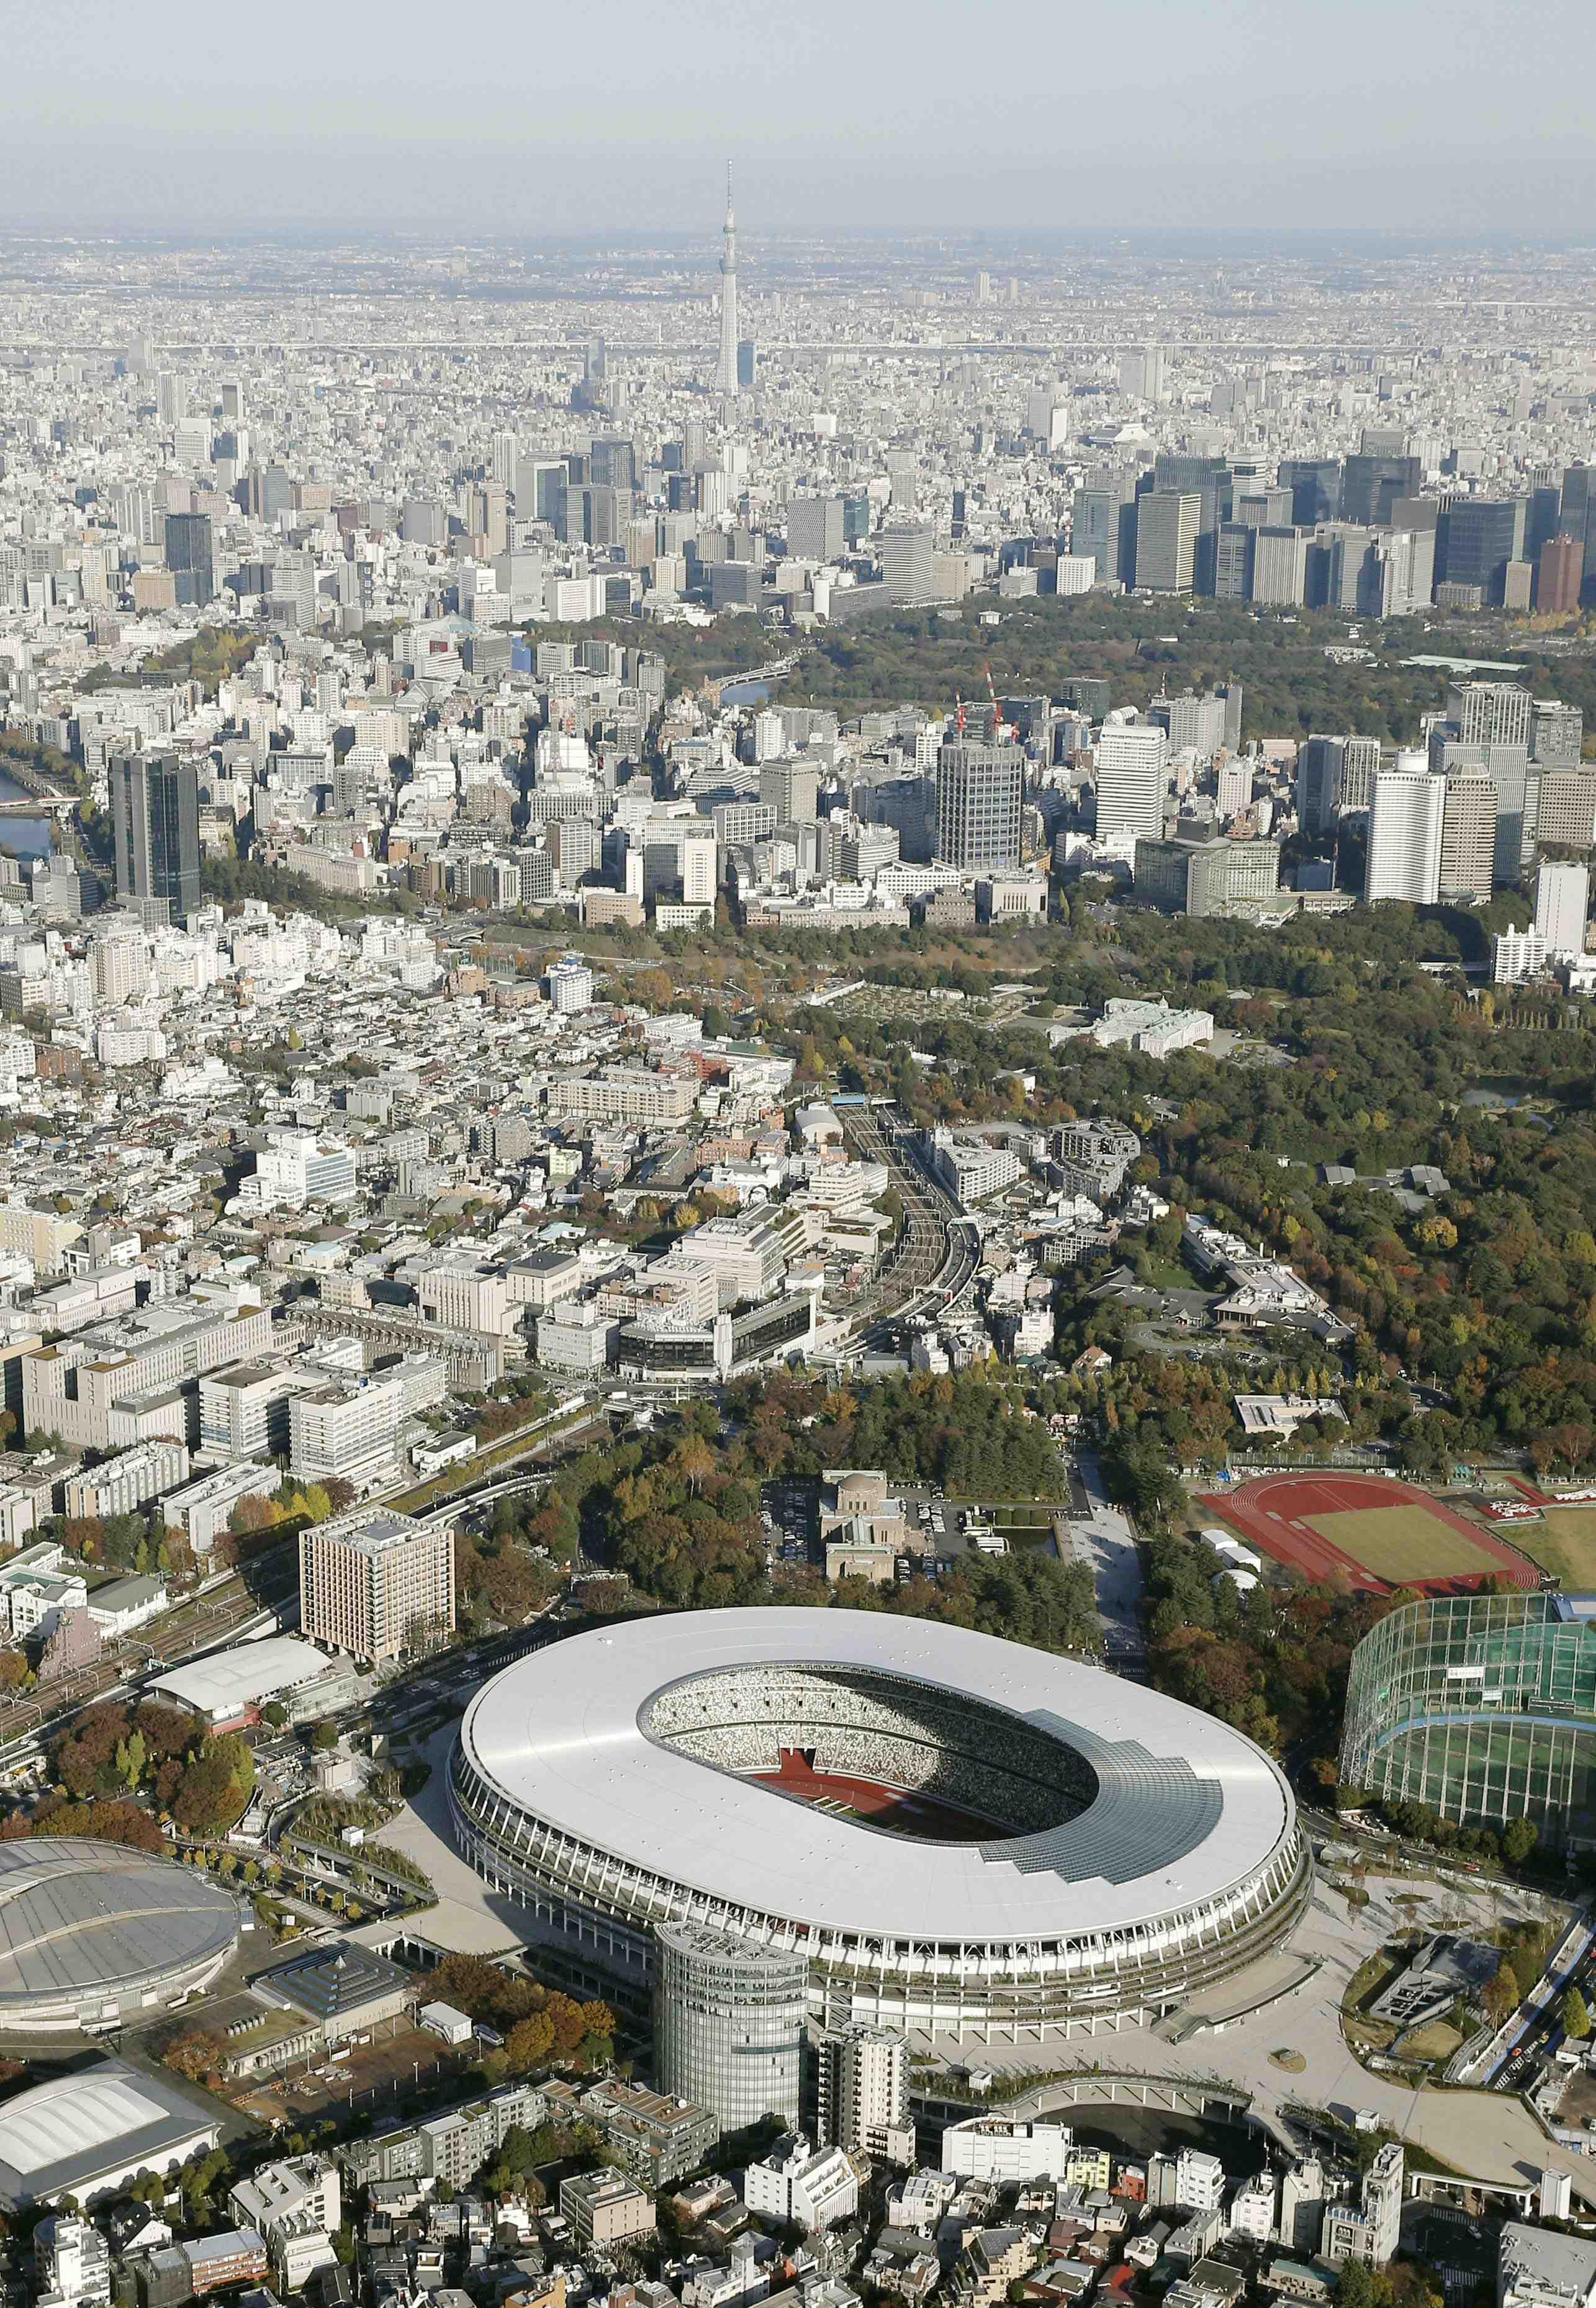 Japan New National Stadium Tokyo Olympics 2020 016